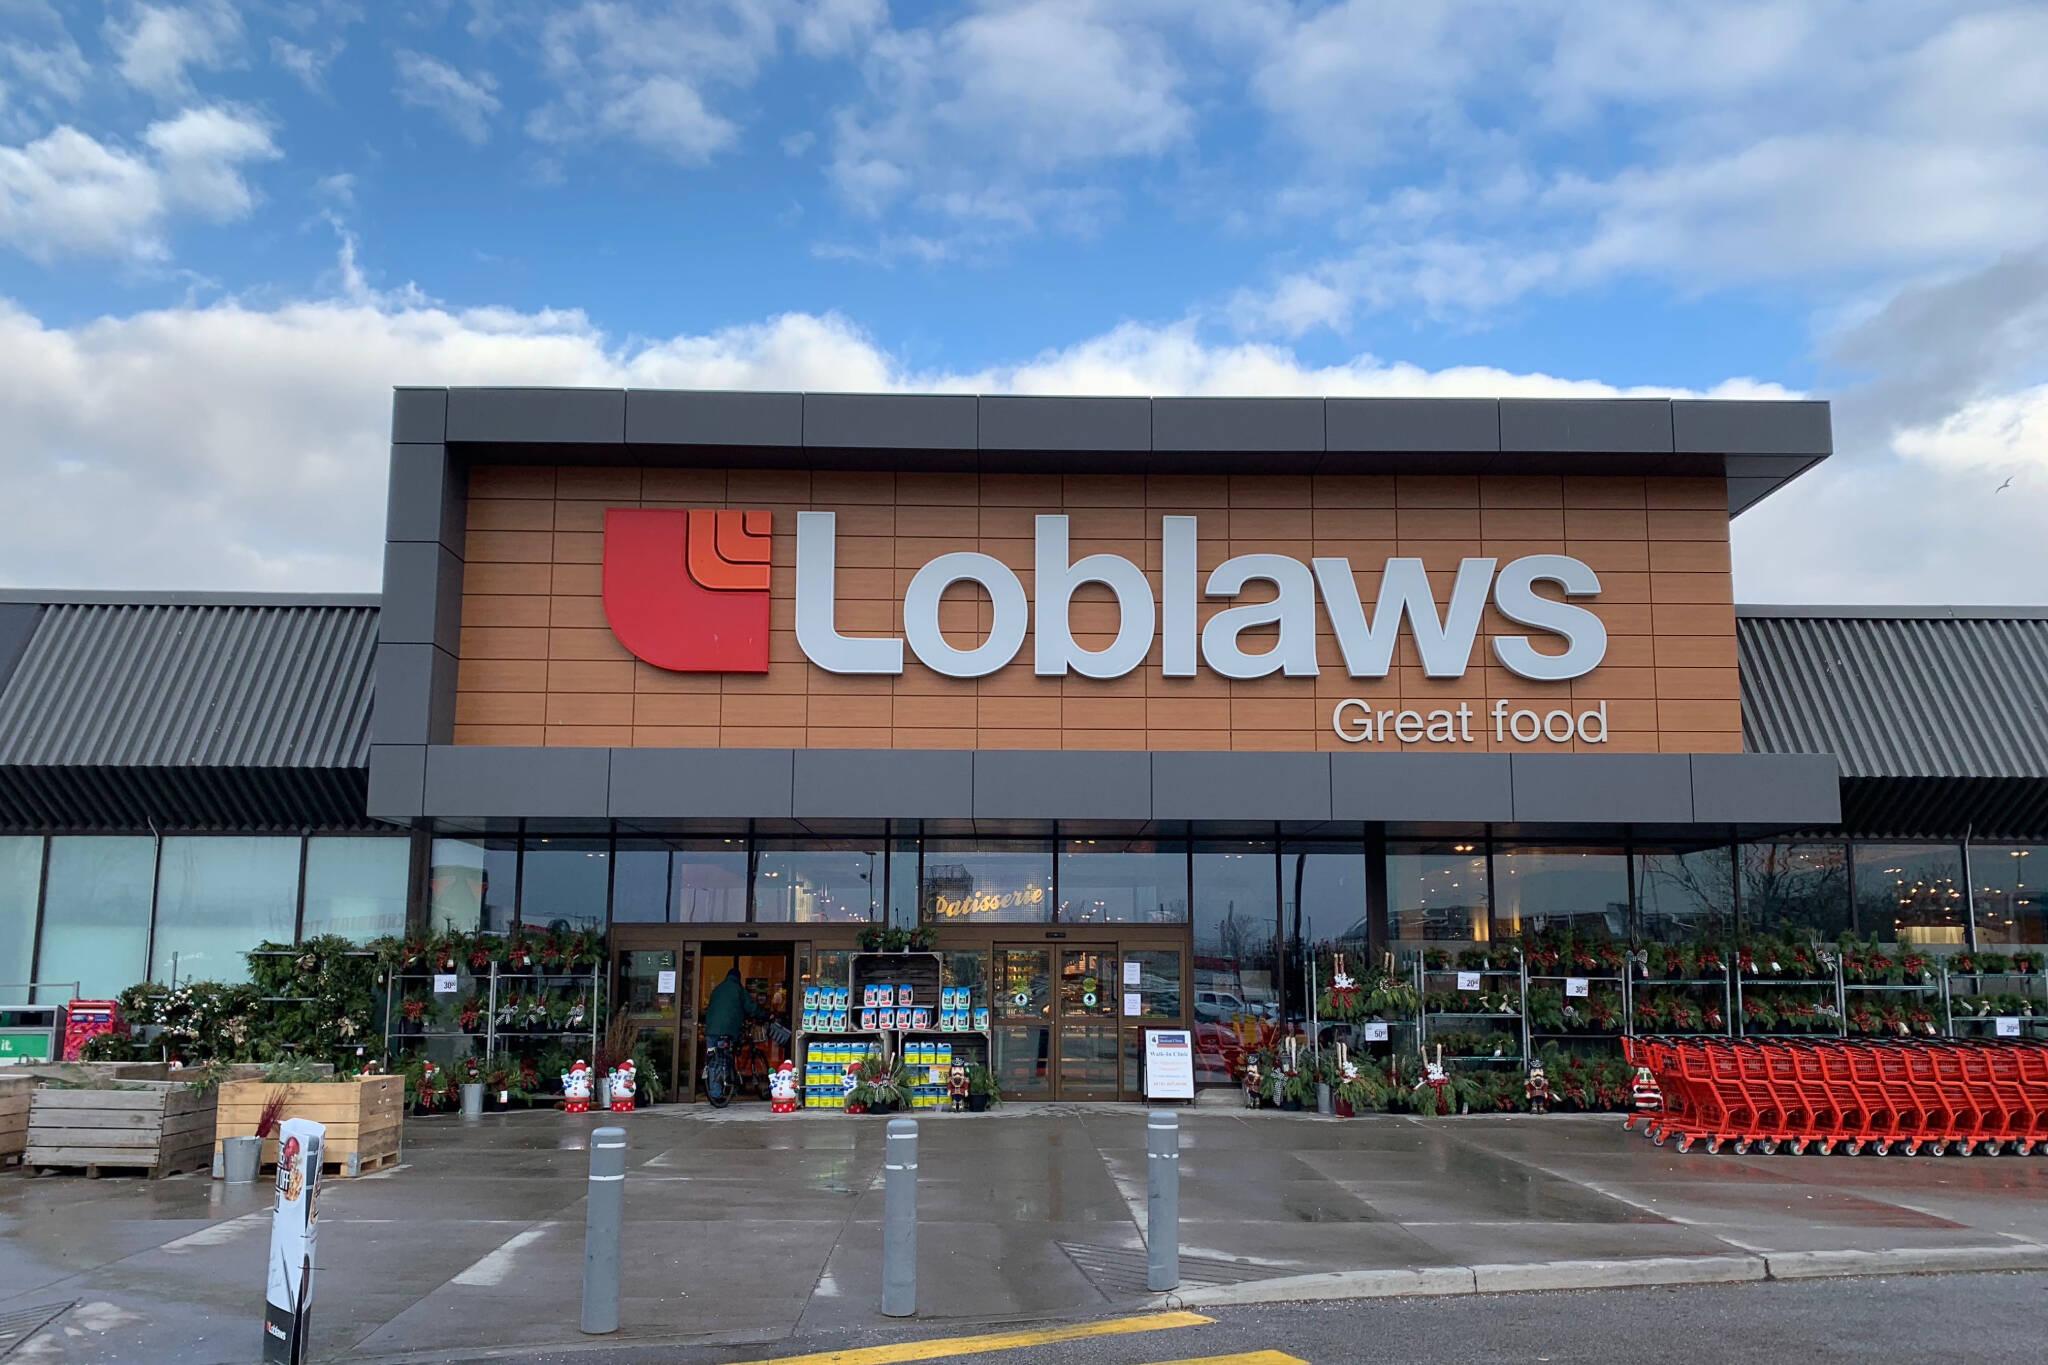 loblaws self scan